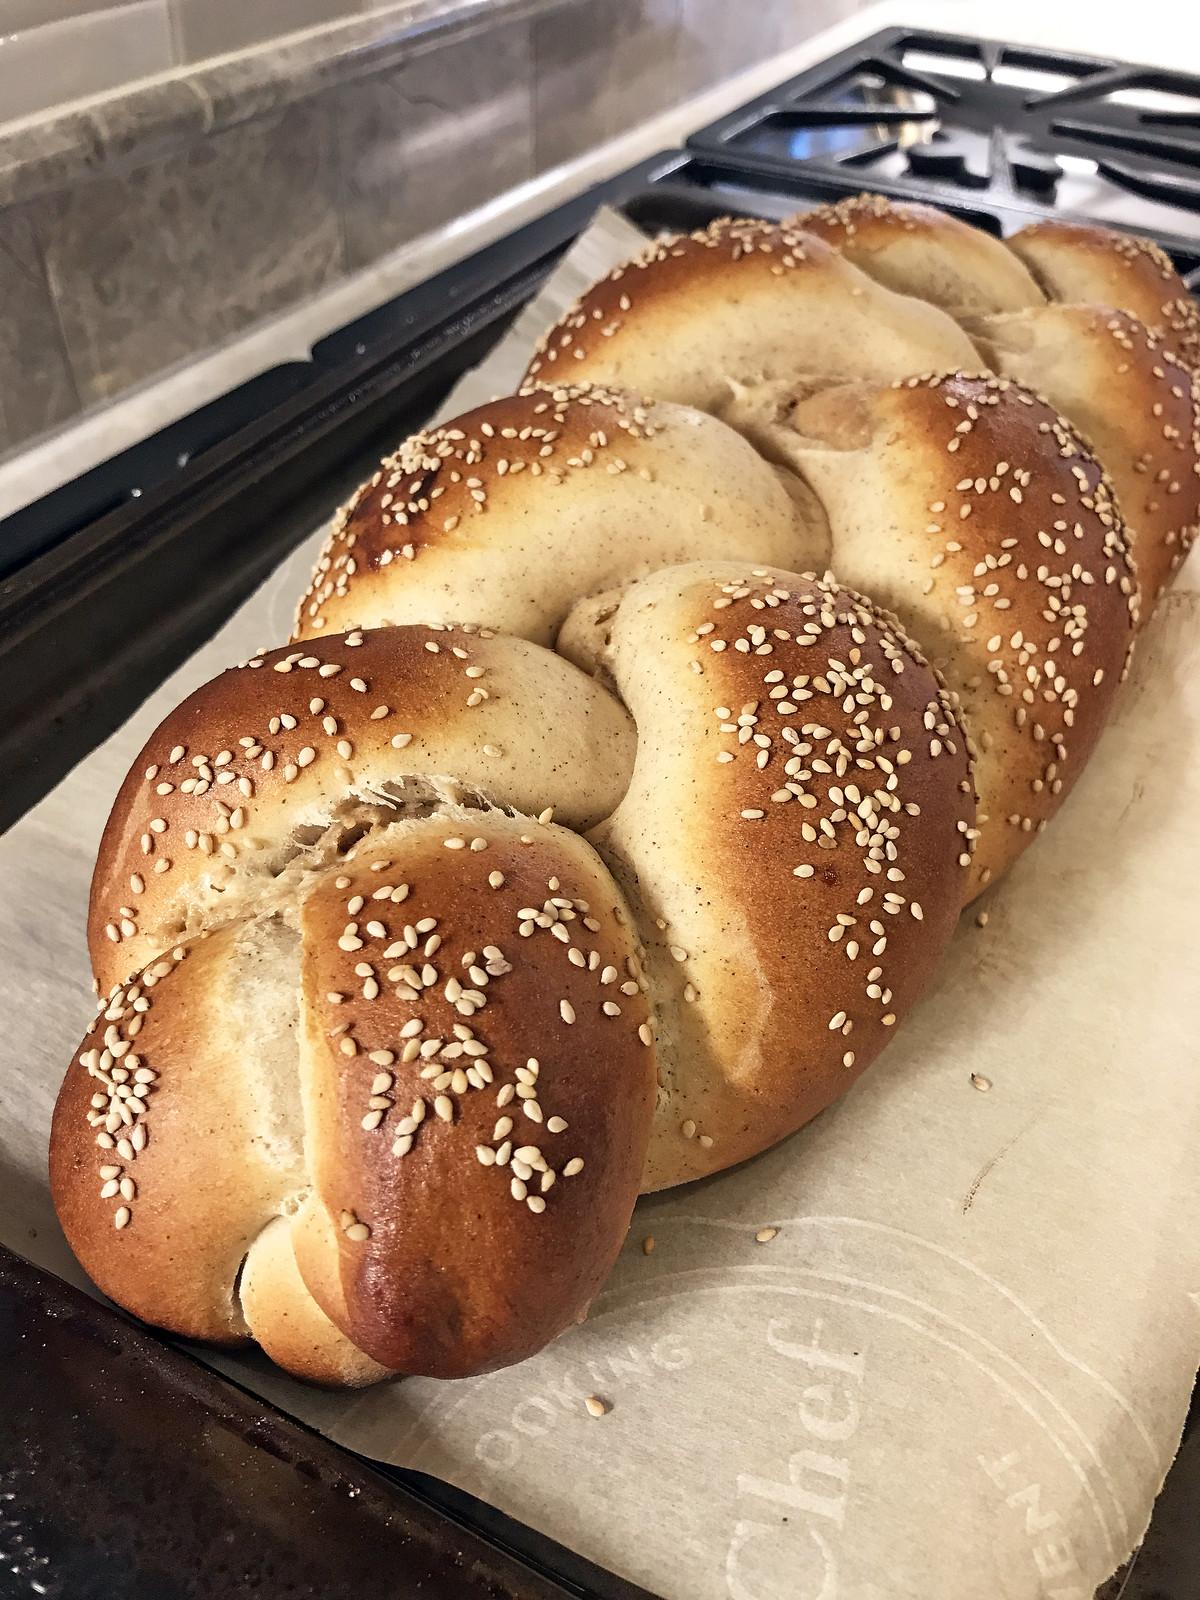 Halvah-stuffed challah